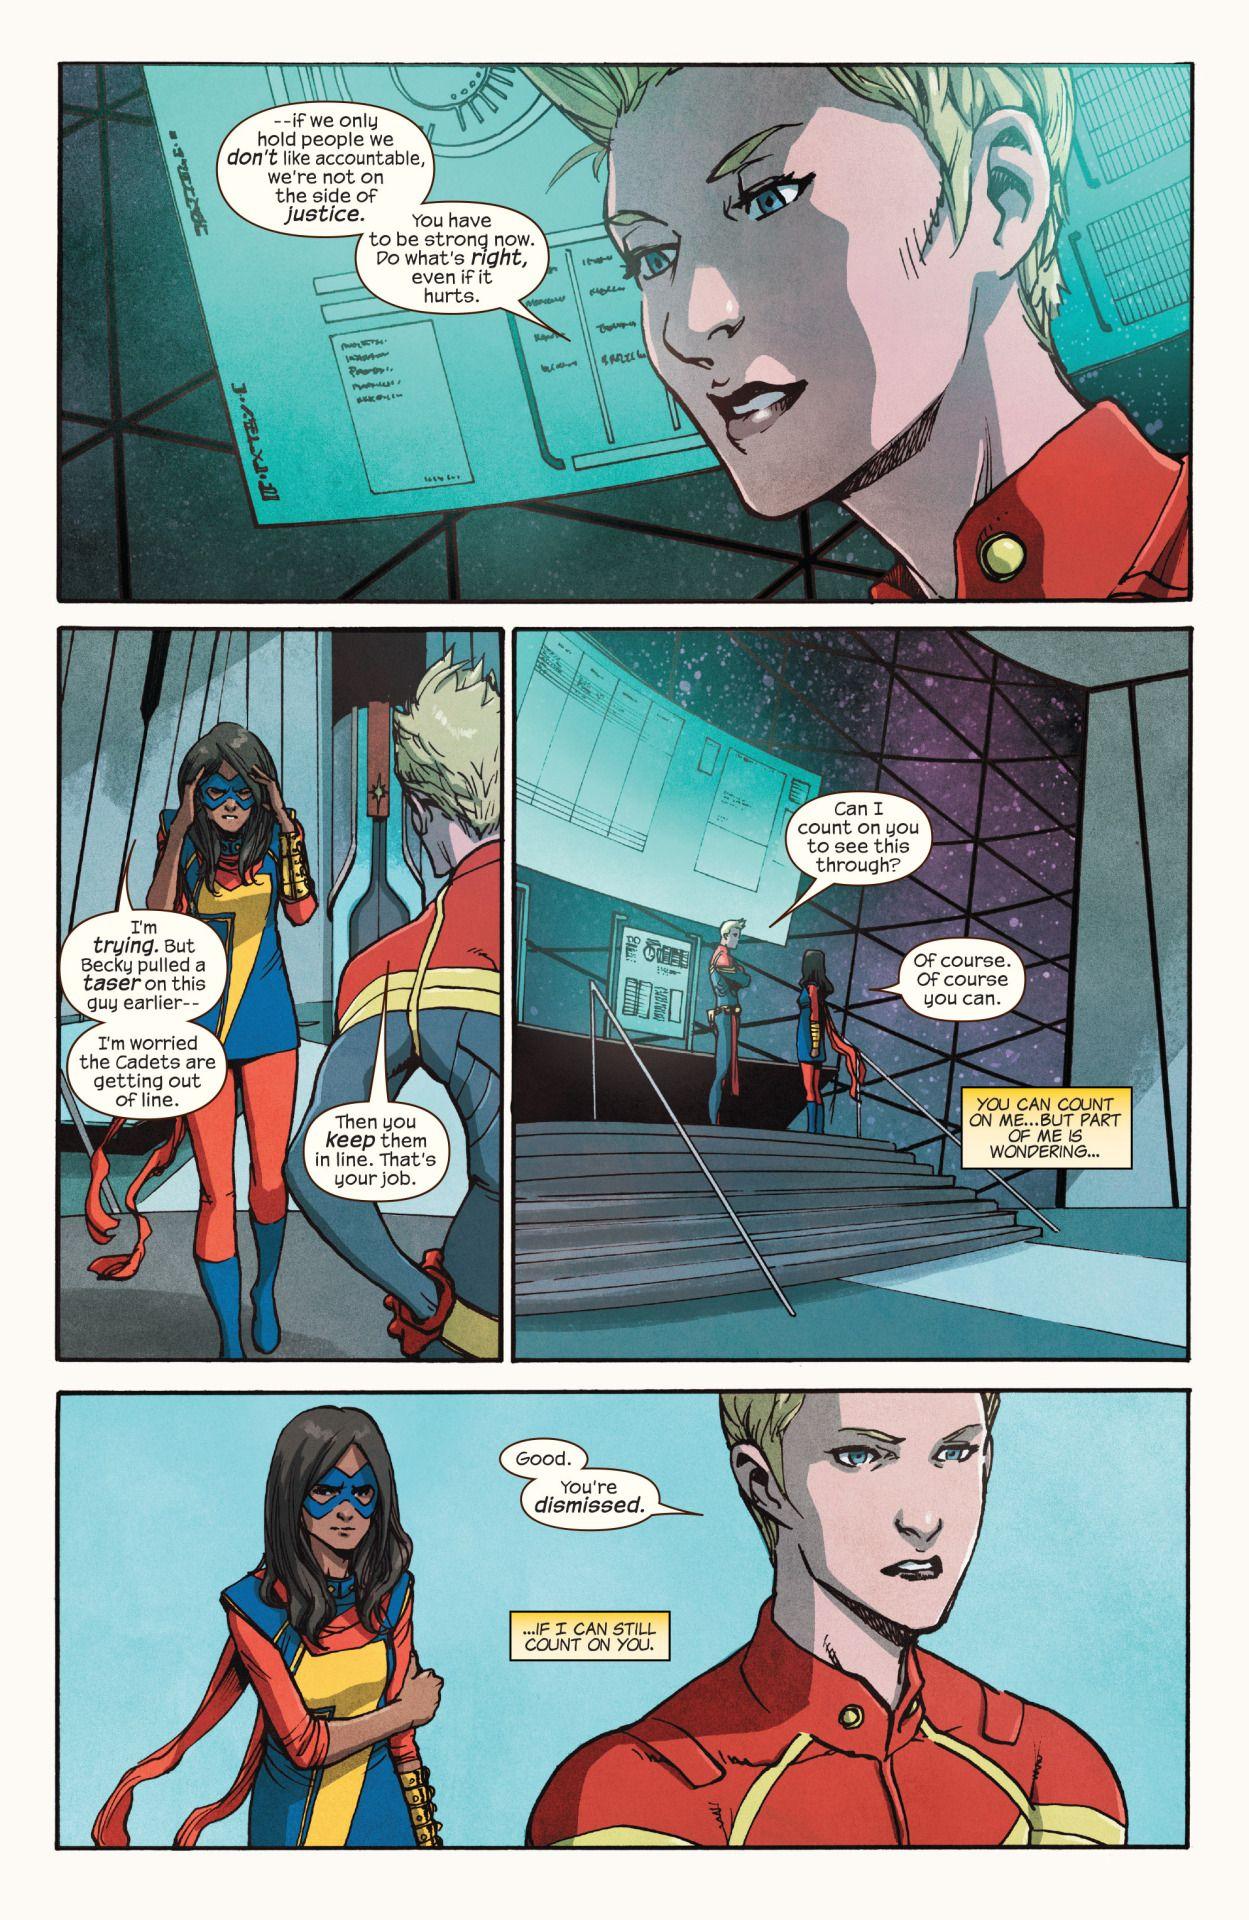 Ms. Marvel #9  ( July 2016 ) Written by G. Willow Wilson